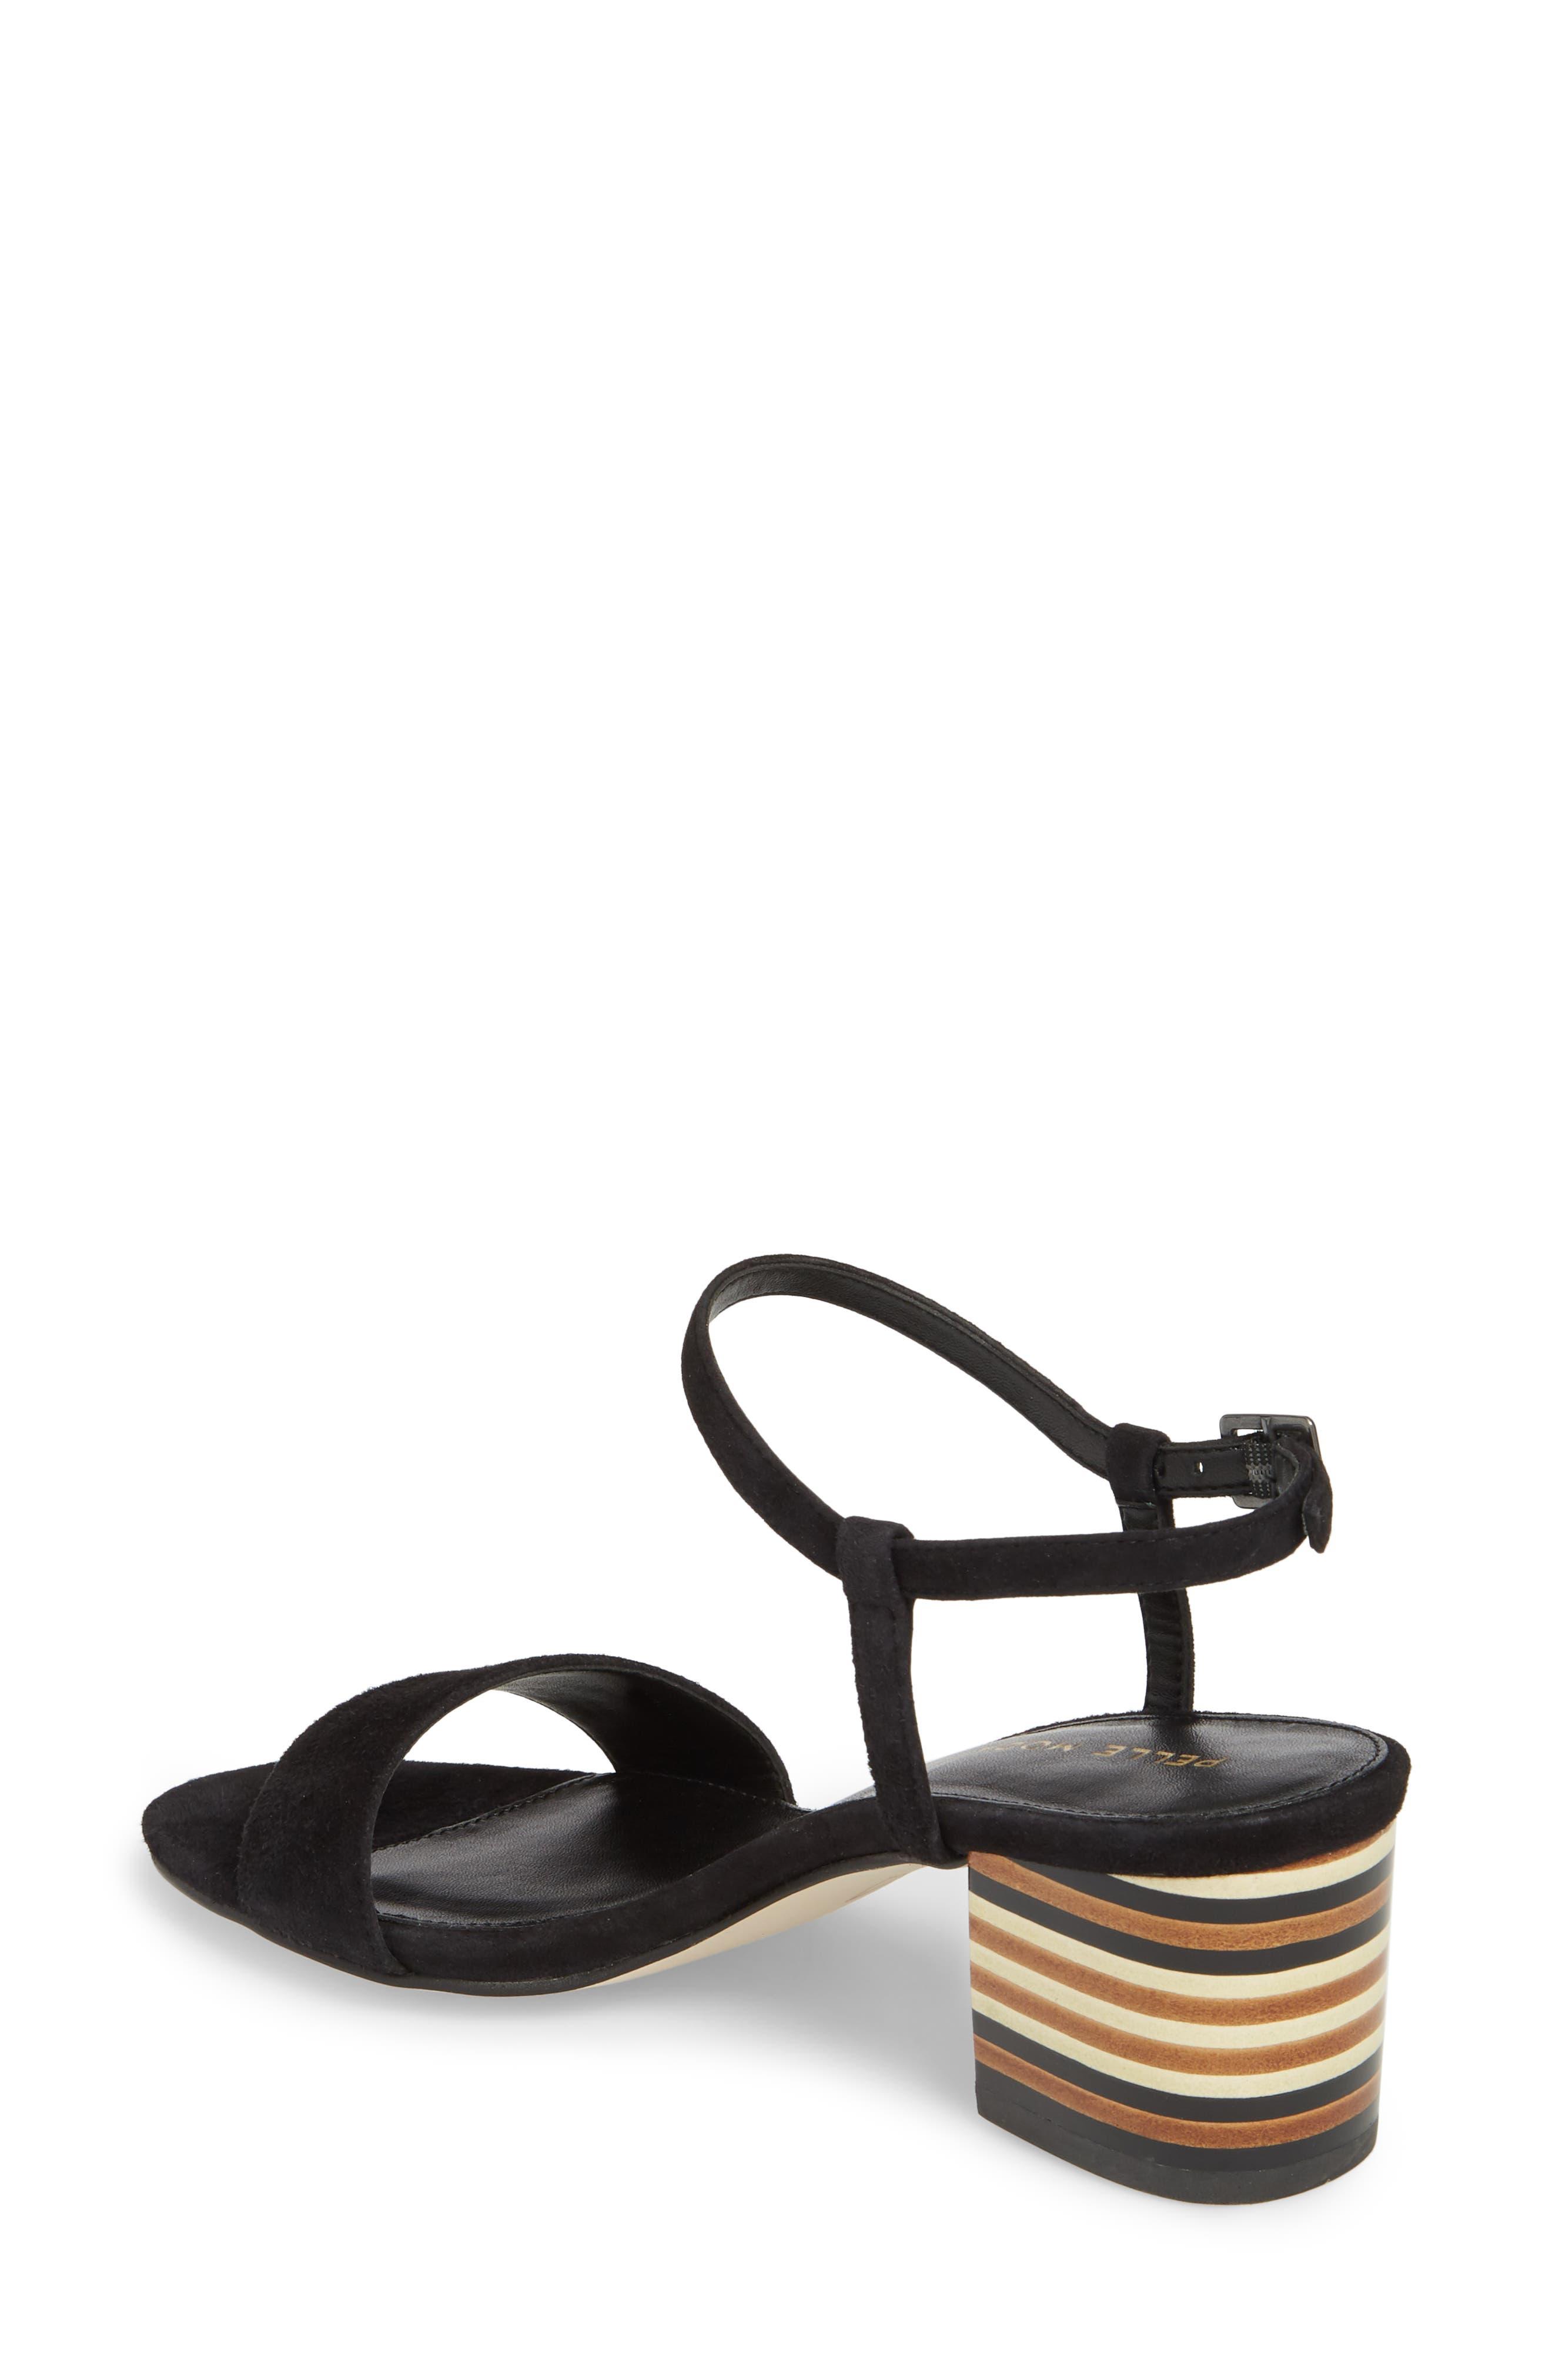 Alicia Block Heel Sandal,                             Alternate thumbnail 2, color,                             BLACK SUEDE